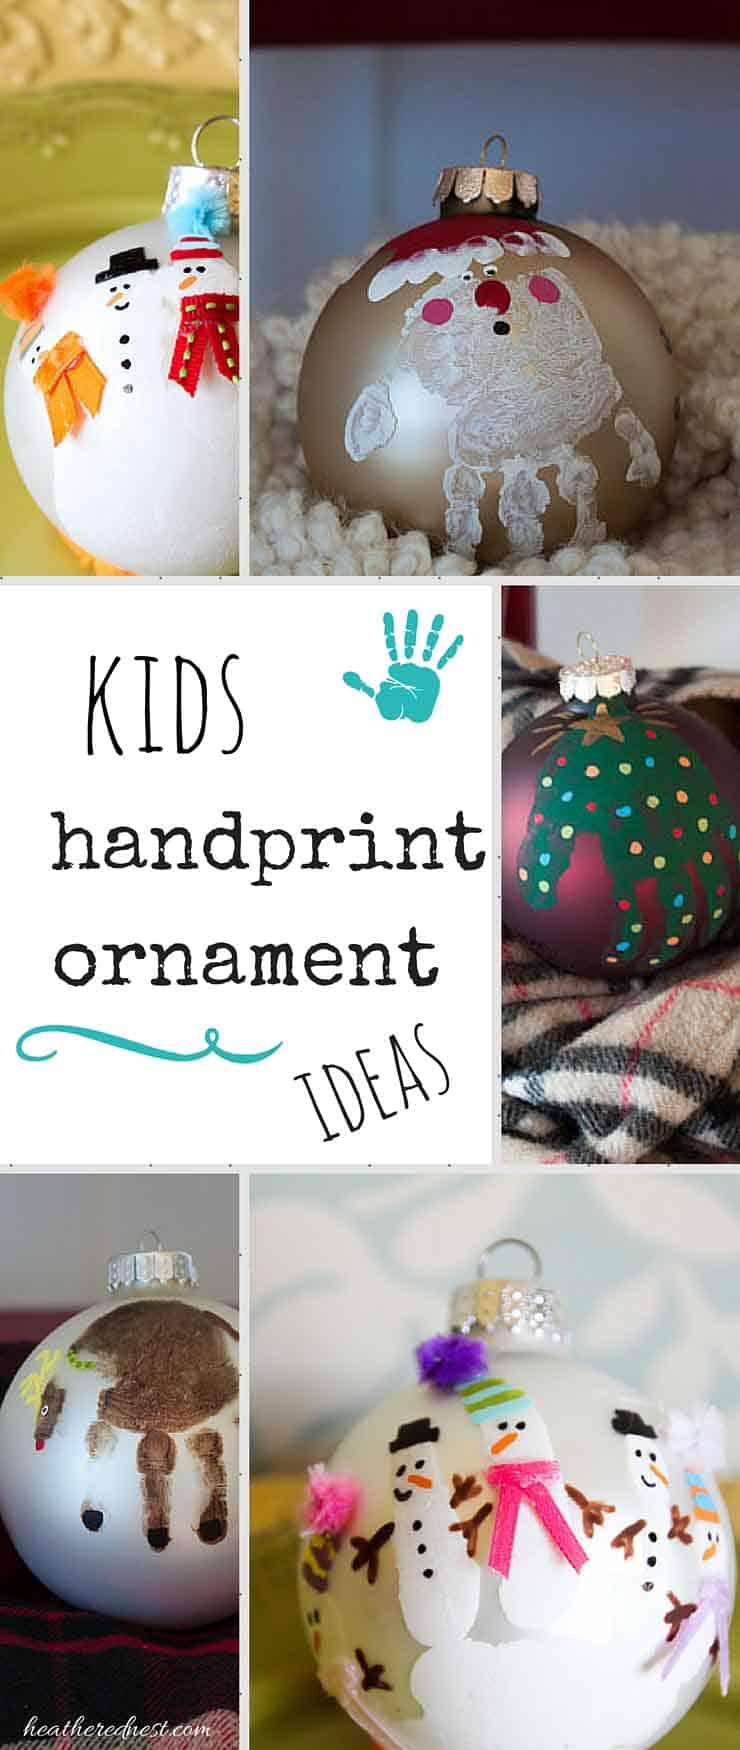 Handprint Ornament and DIY Christmas Ornament Ideas | The ...